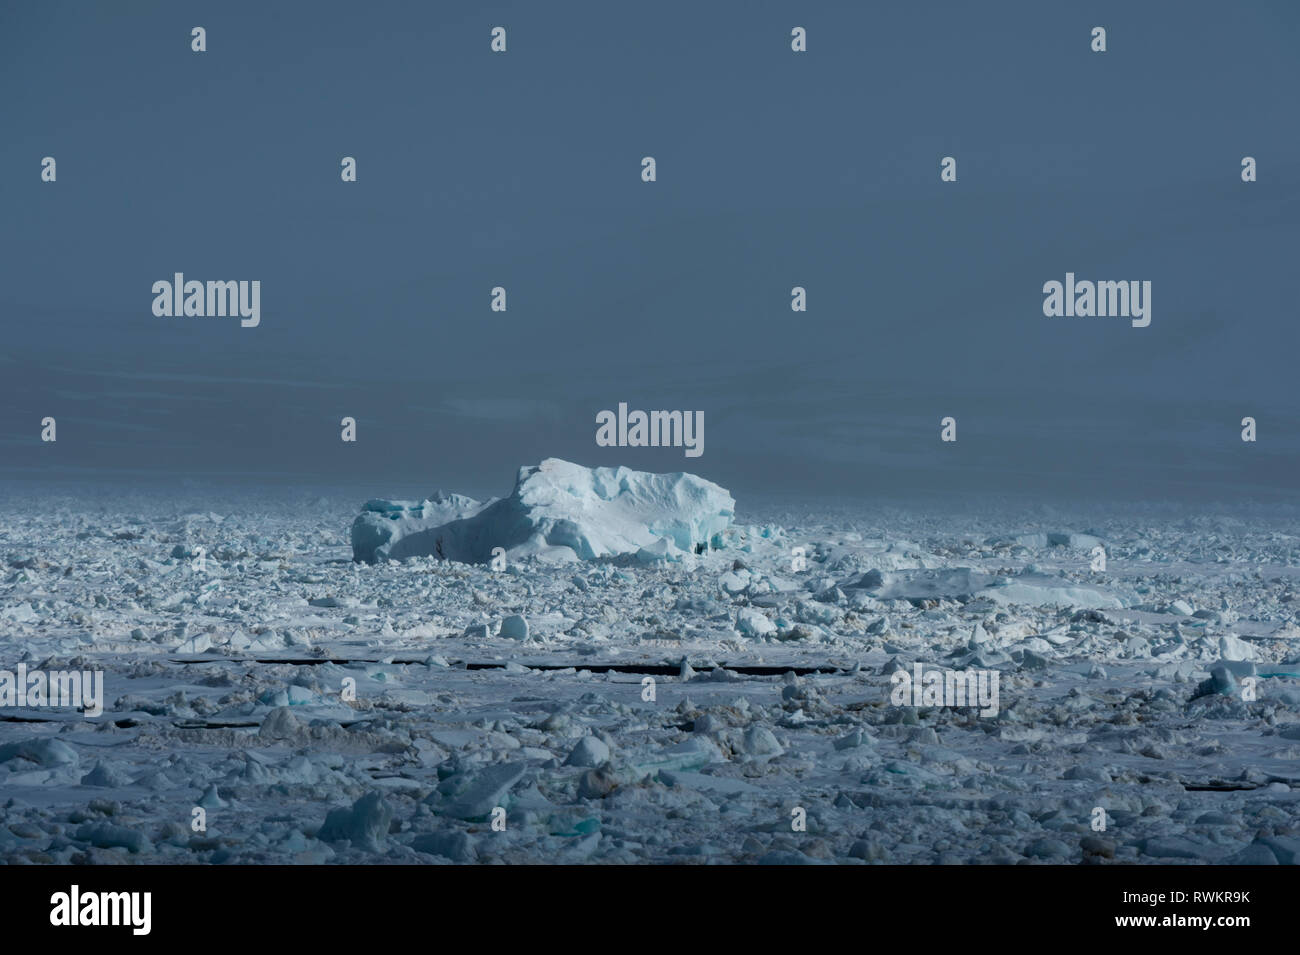 Arctic ocean sea ice and coastal mist, Wahlenberg fjord, Nordaustlandet, Svalbard, Norway. - Stock Image